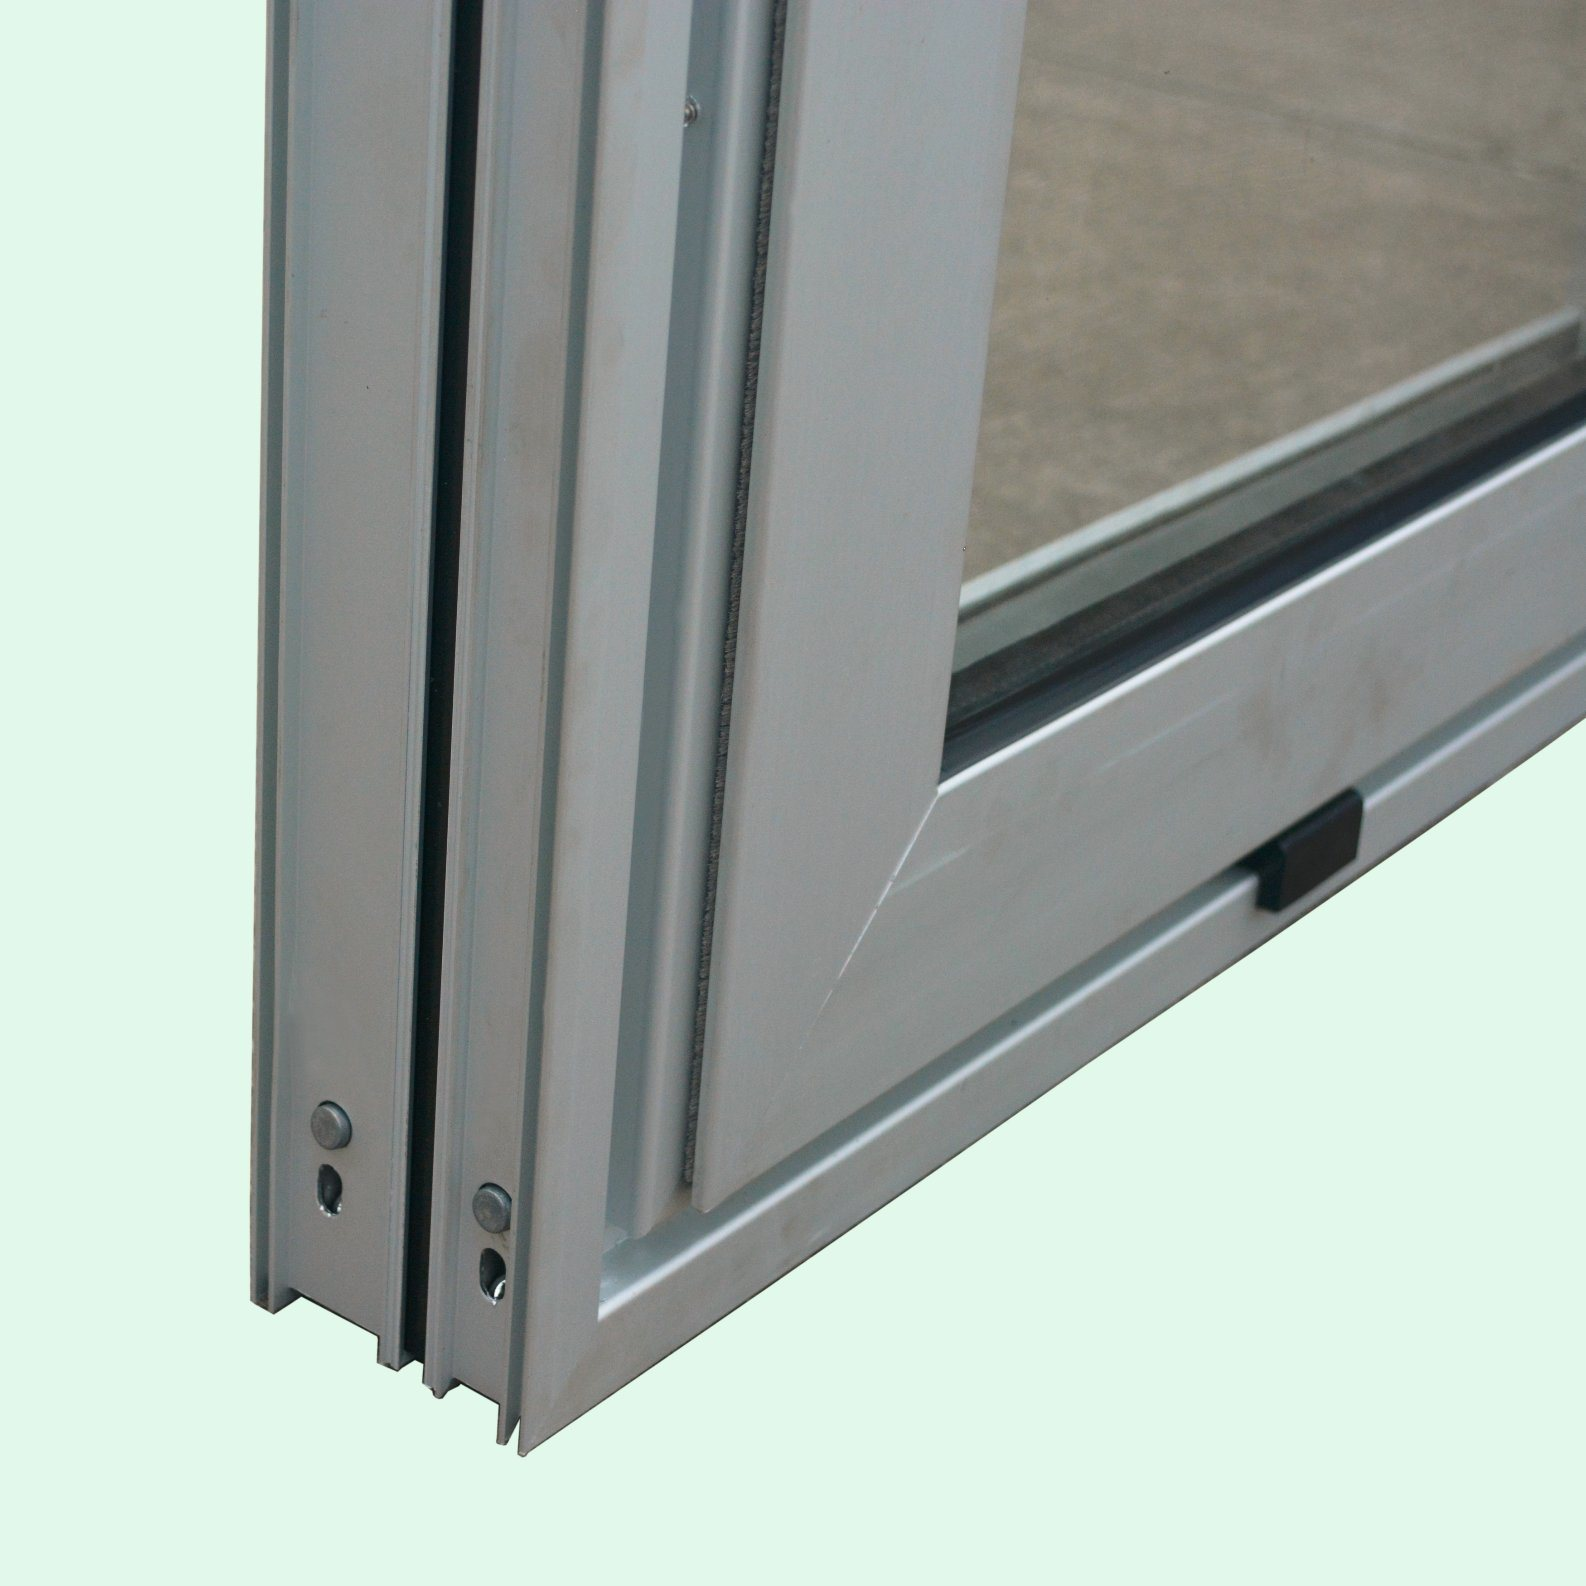 Powder Coated Thermal Break Aluminum Alloy Window with Latch Lock, Aluminum Sliding Window K01010